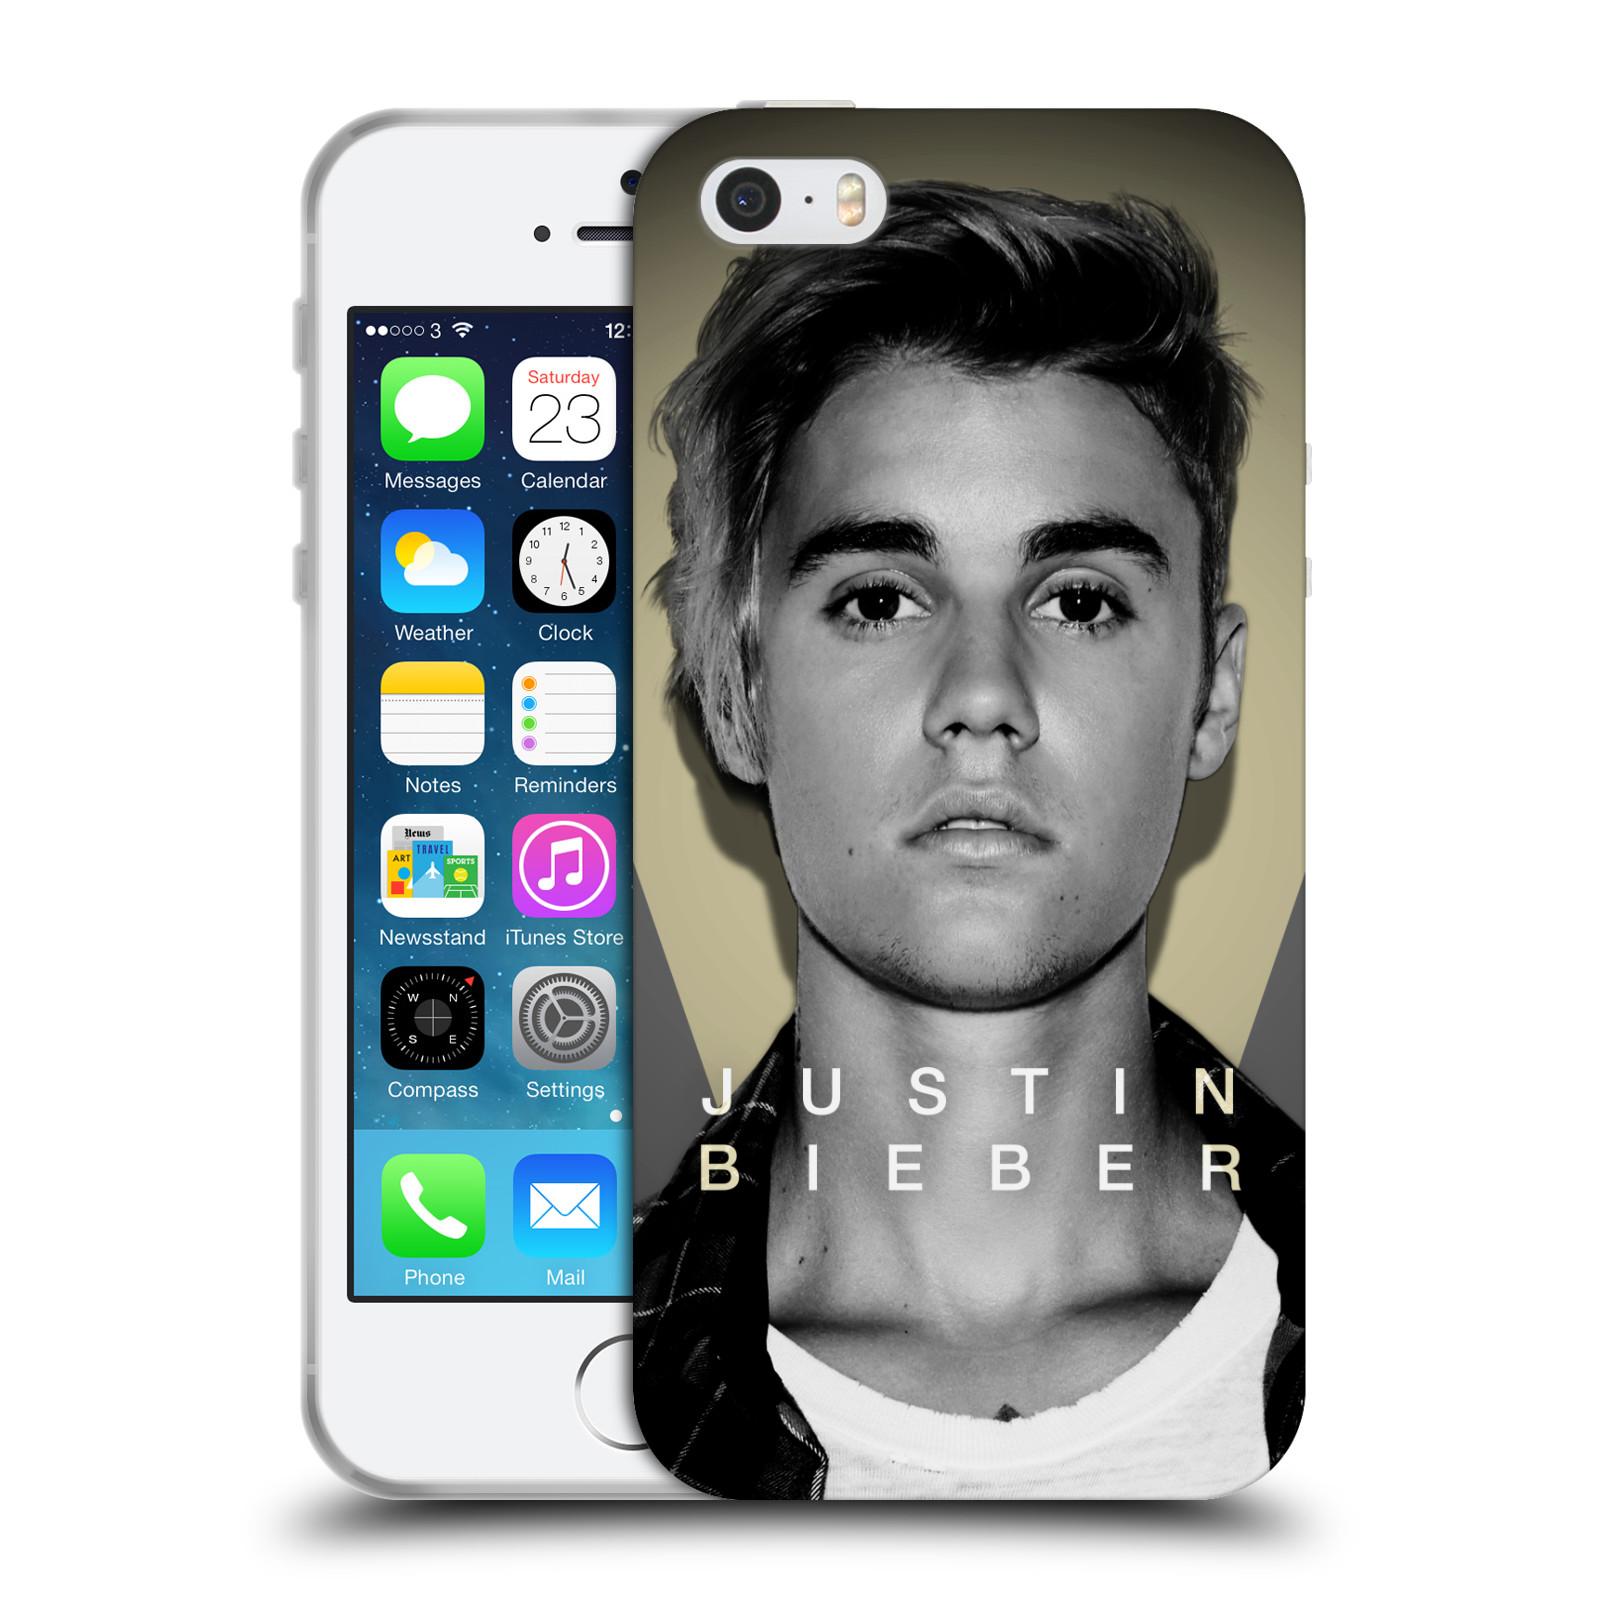 HEAD CASE silikonový obal na mobil Apple Iphone 5 / 5S originální potisk Justin Bieber foto portrét